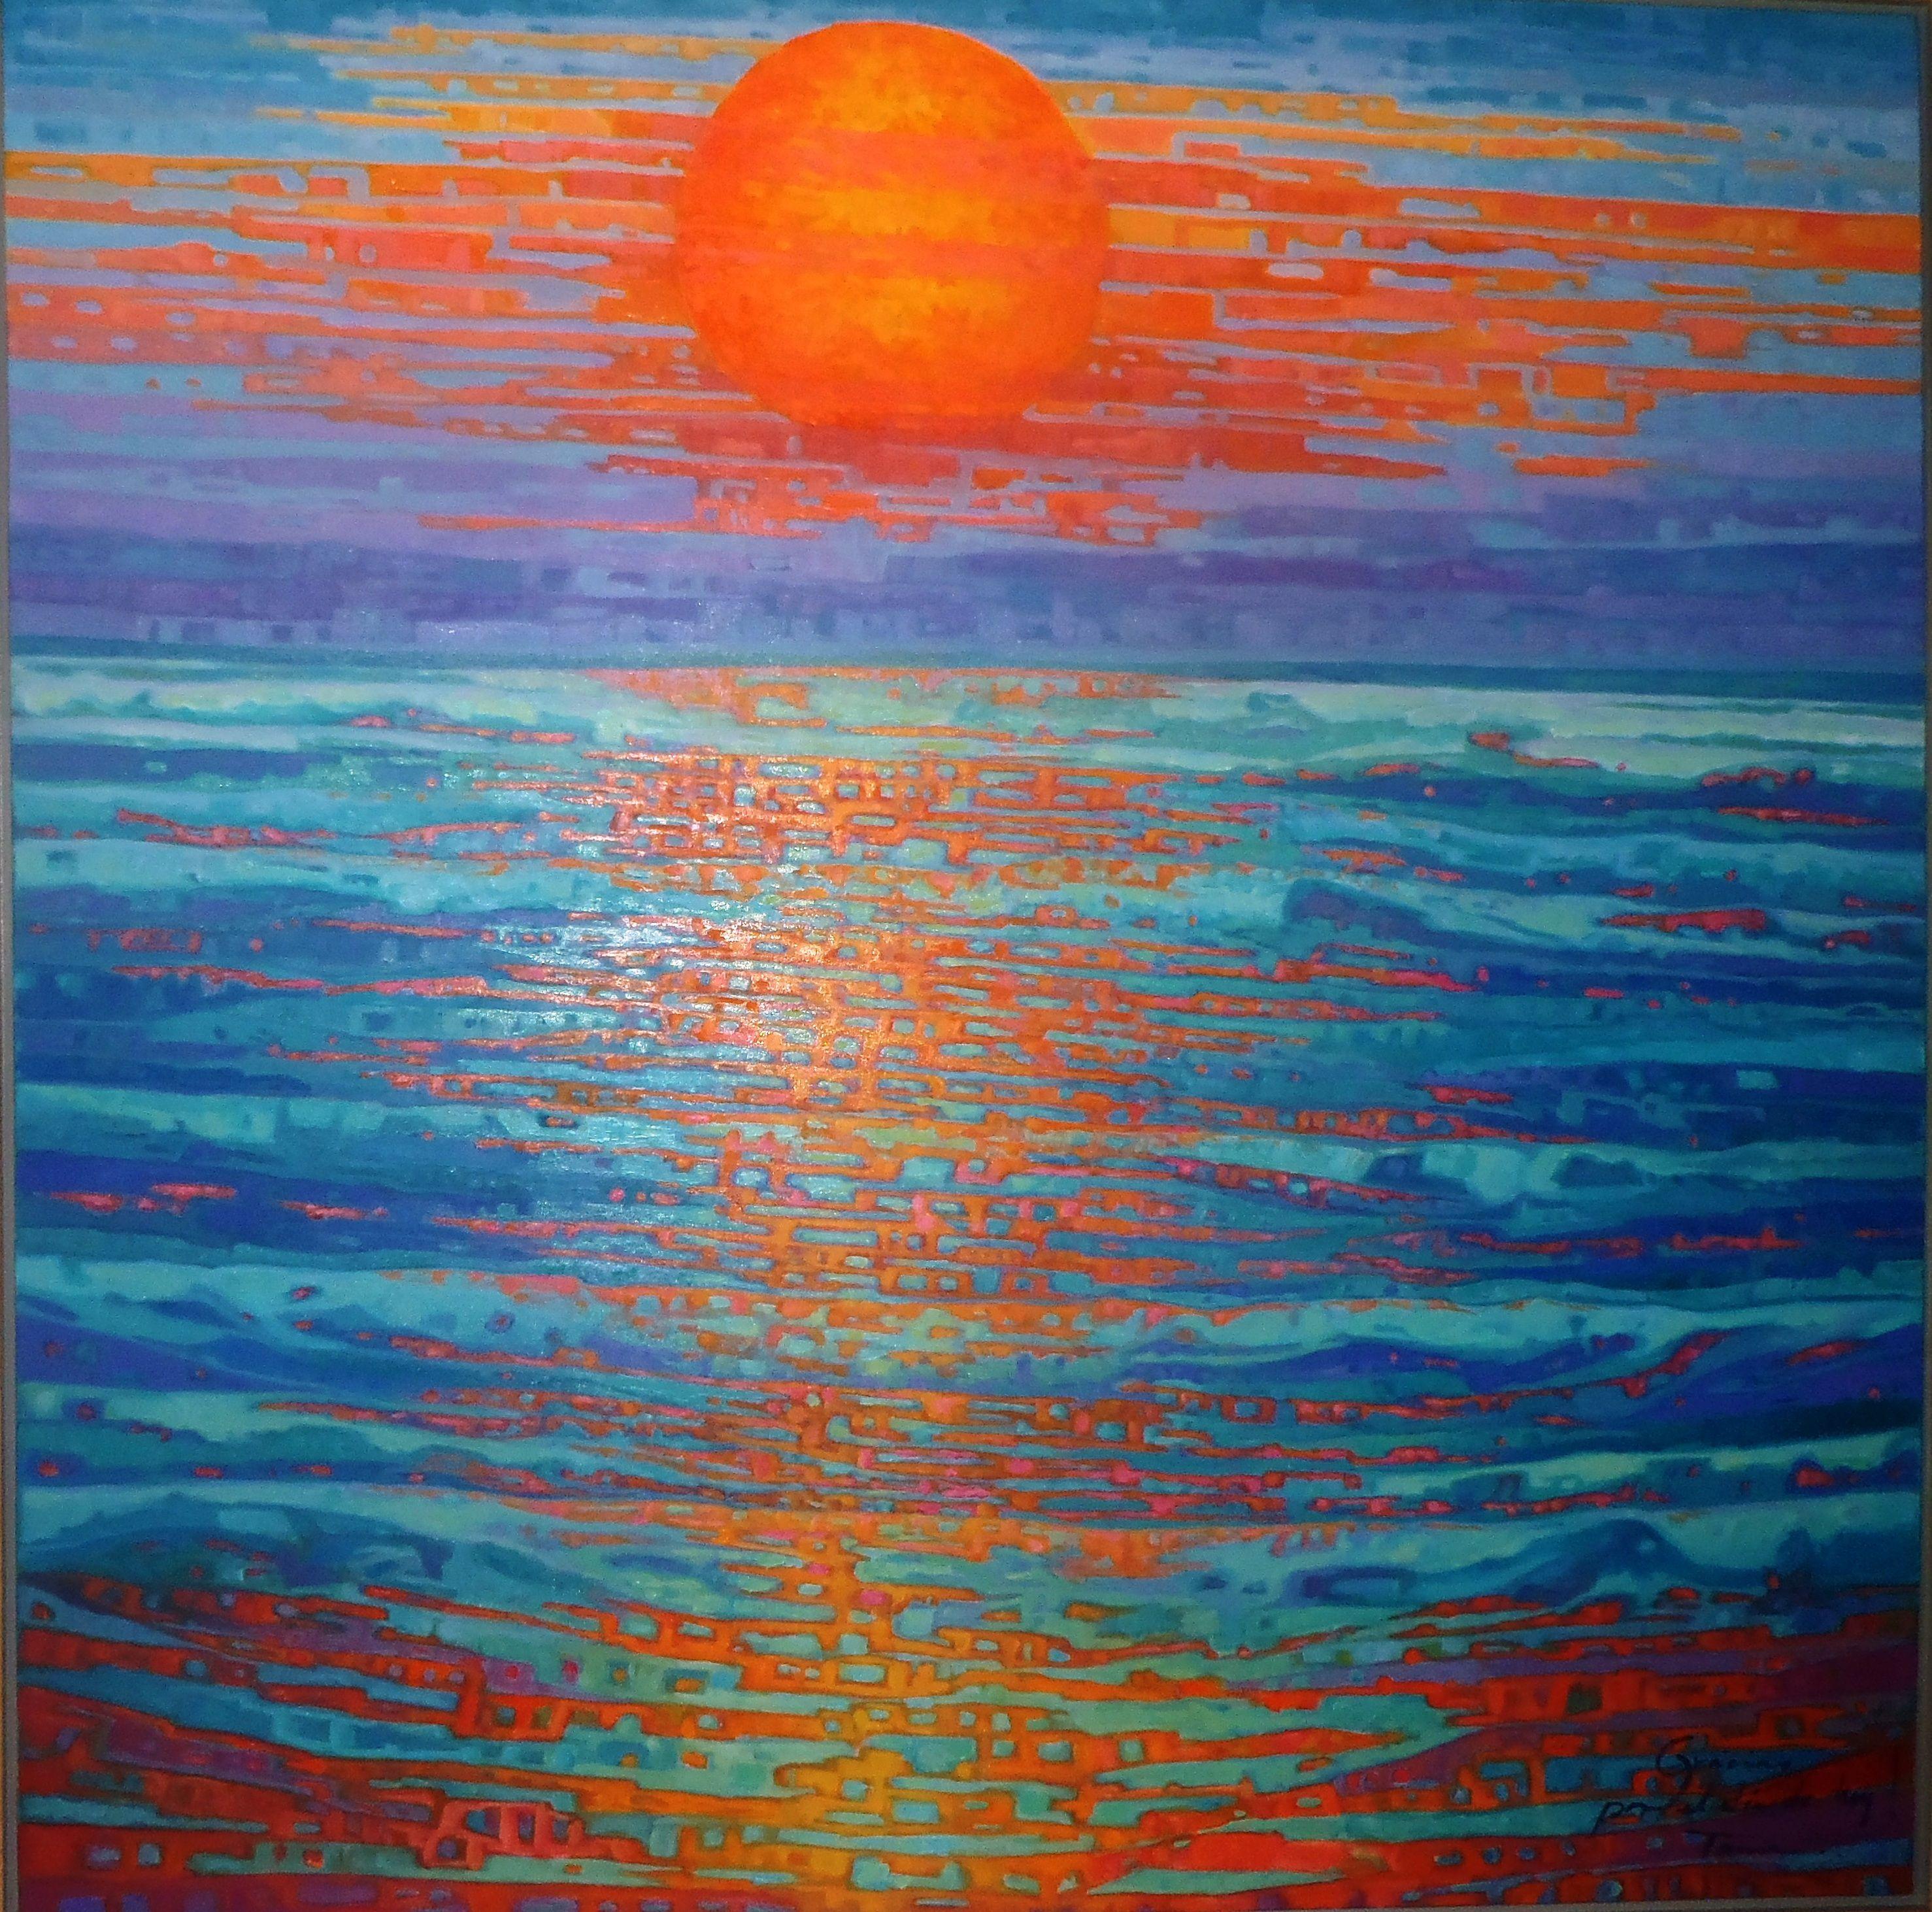 ART. TANIA CAMARA. GRACIAS POR EL DIA DE HOY. 2015. OLEO SOBRE TELA. 1.50 X 1.50 MTRS.2014